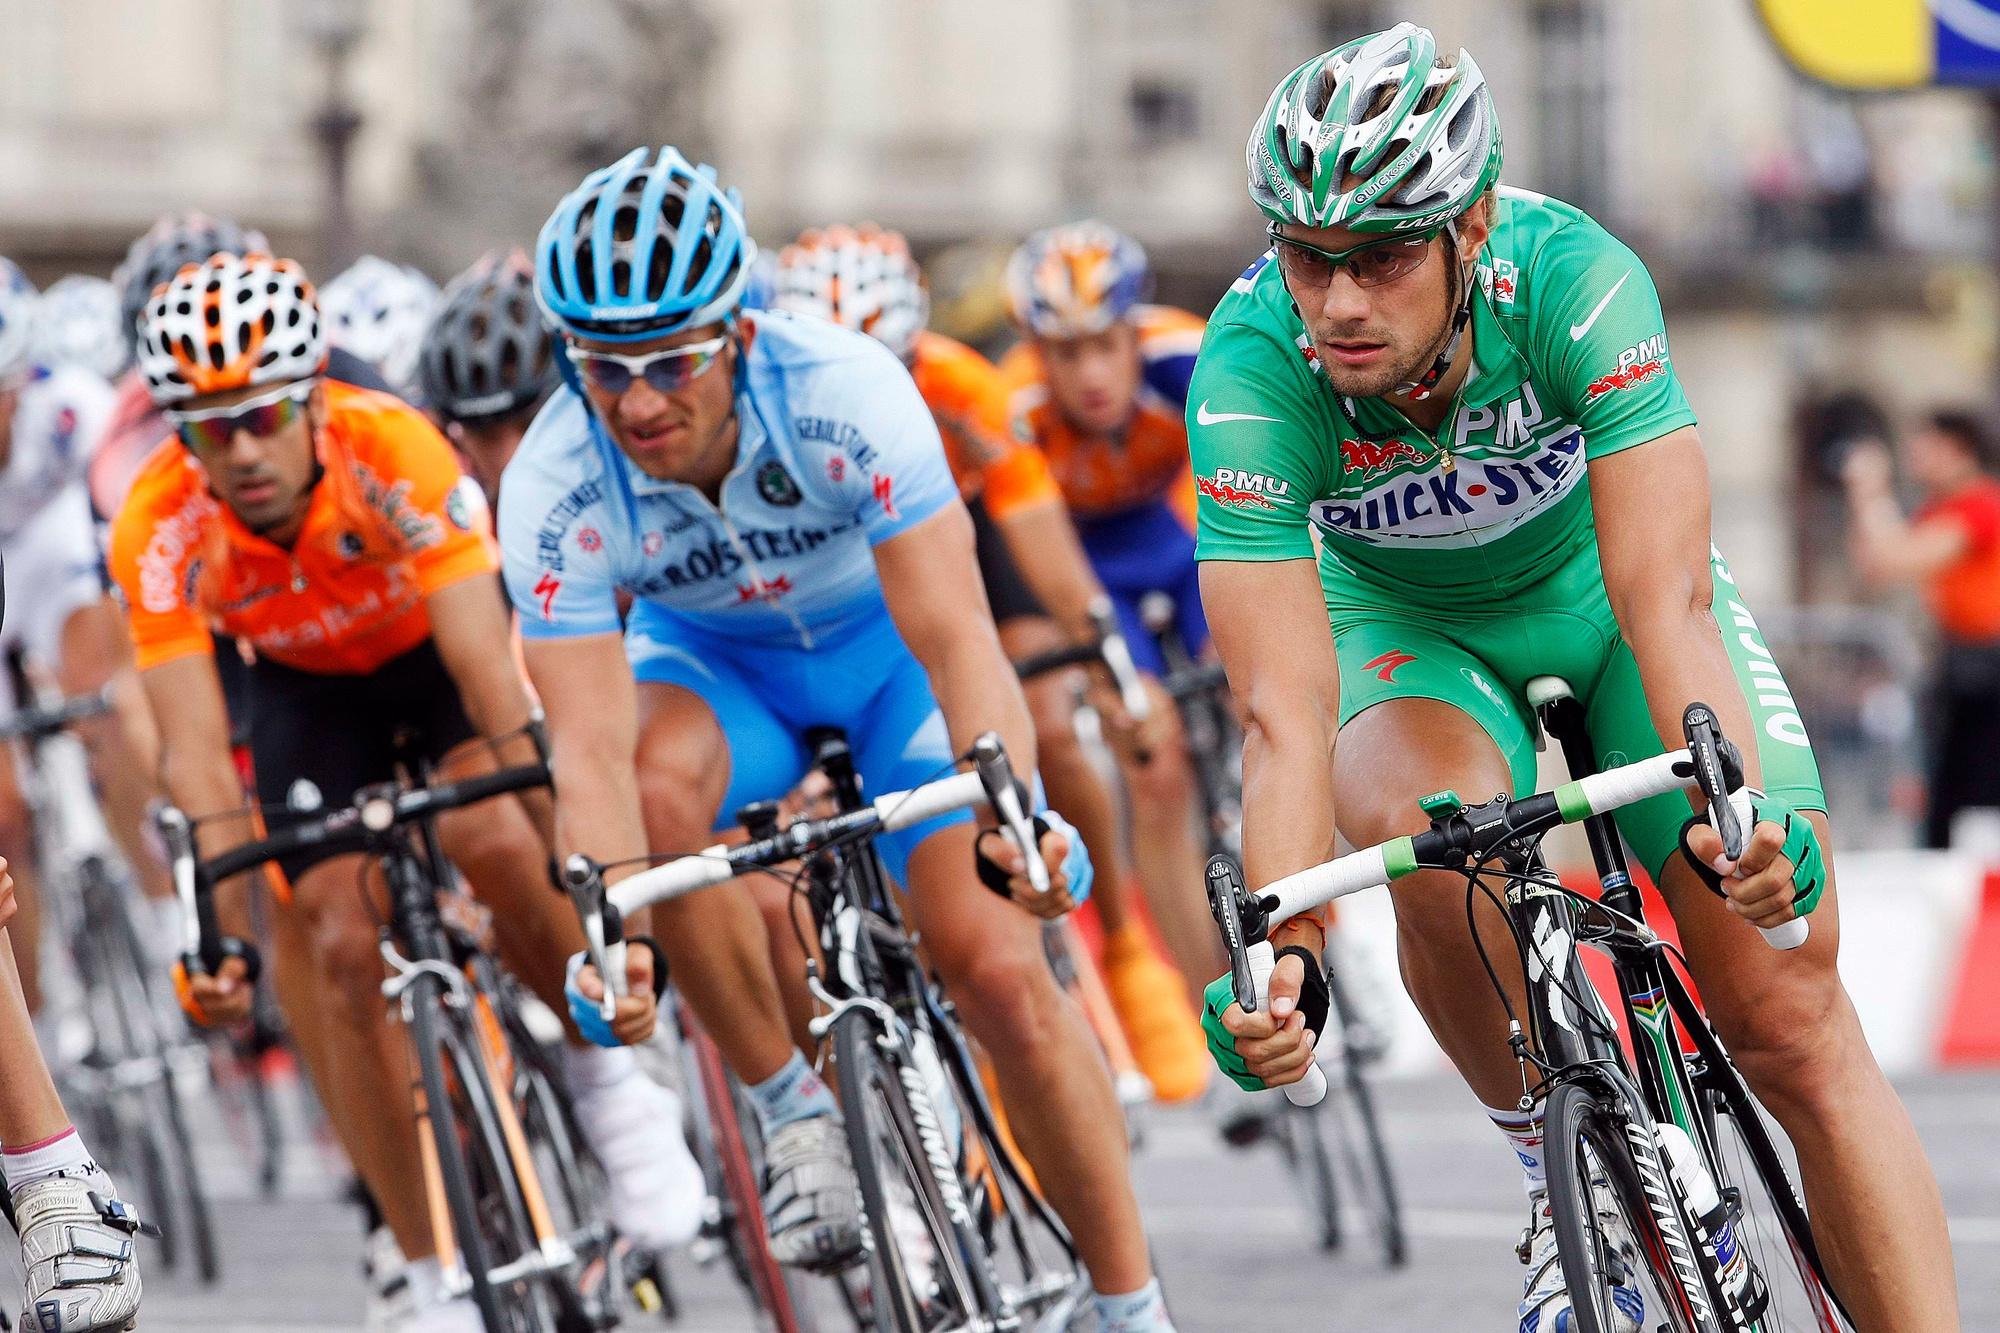 Tom Boonen, maillot vert du Tour de France 2007., ICONSPORT